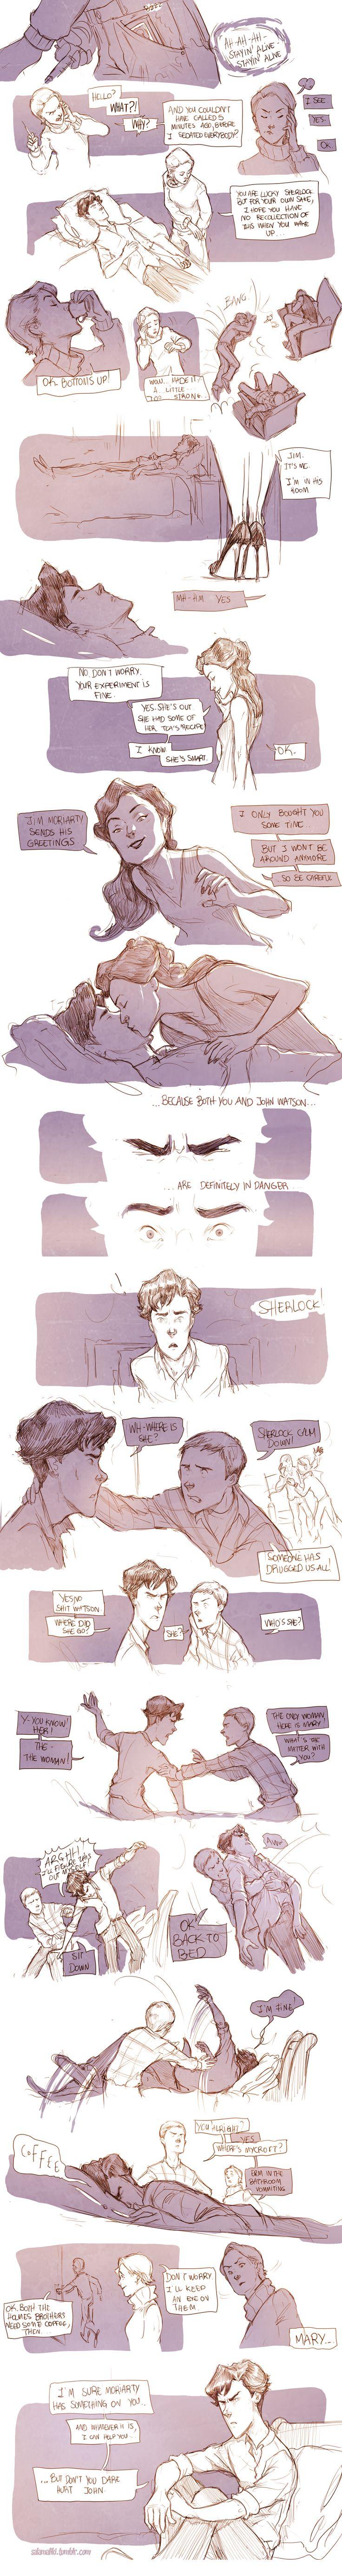 Teen Sherlock - The sign of three Pt3 by DrSlug.deviantart.com on @deviantART